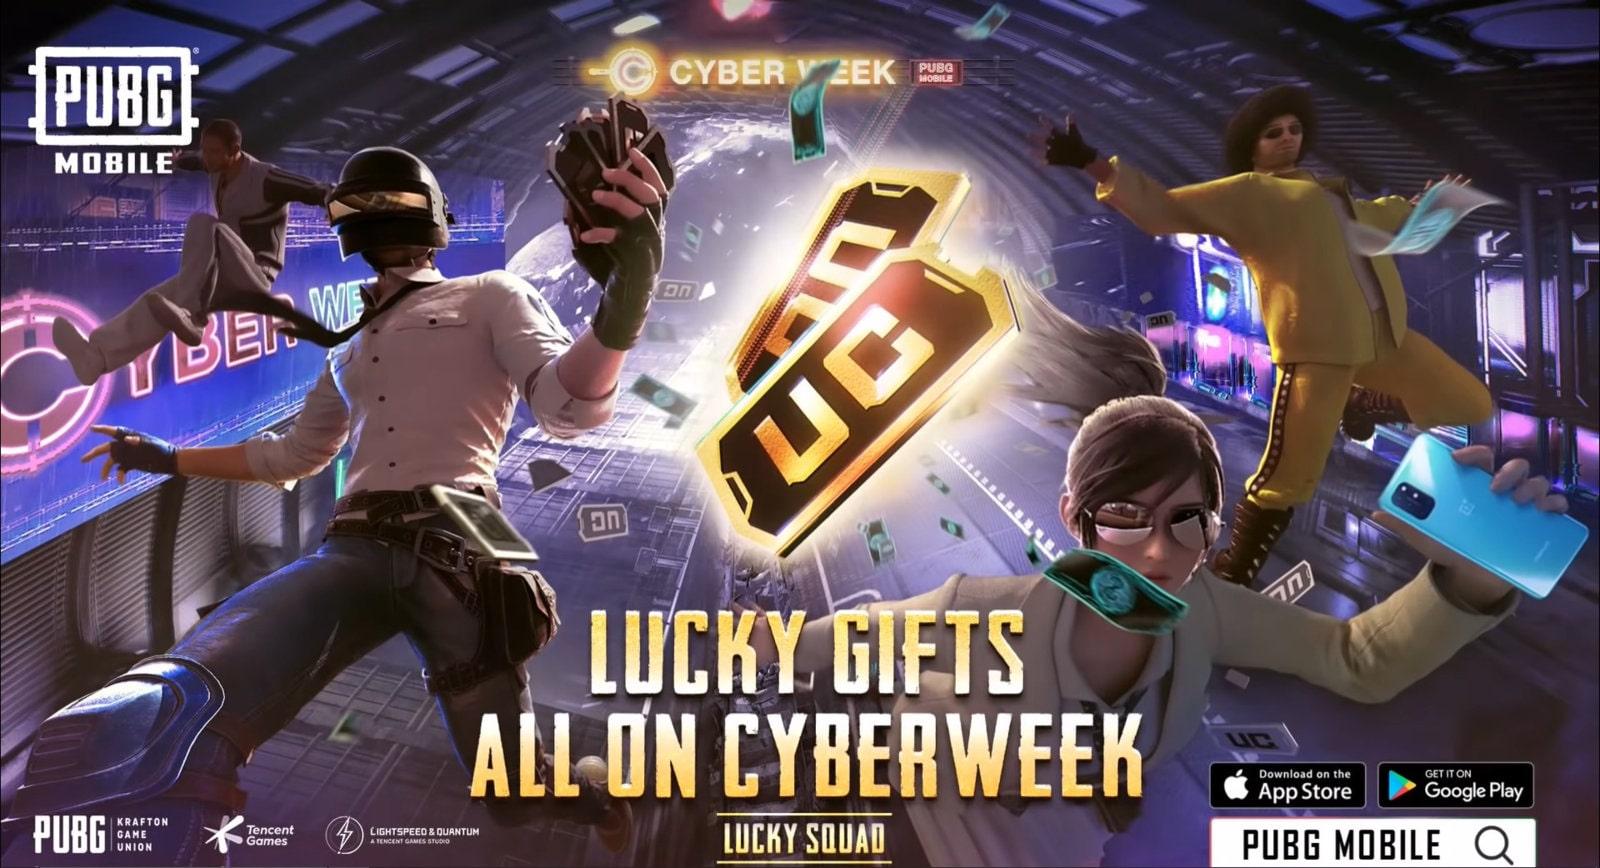 PUBG MOBILE - Cyber Week APK download